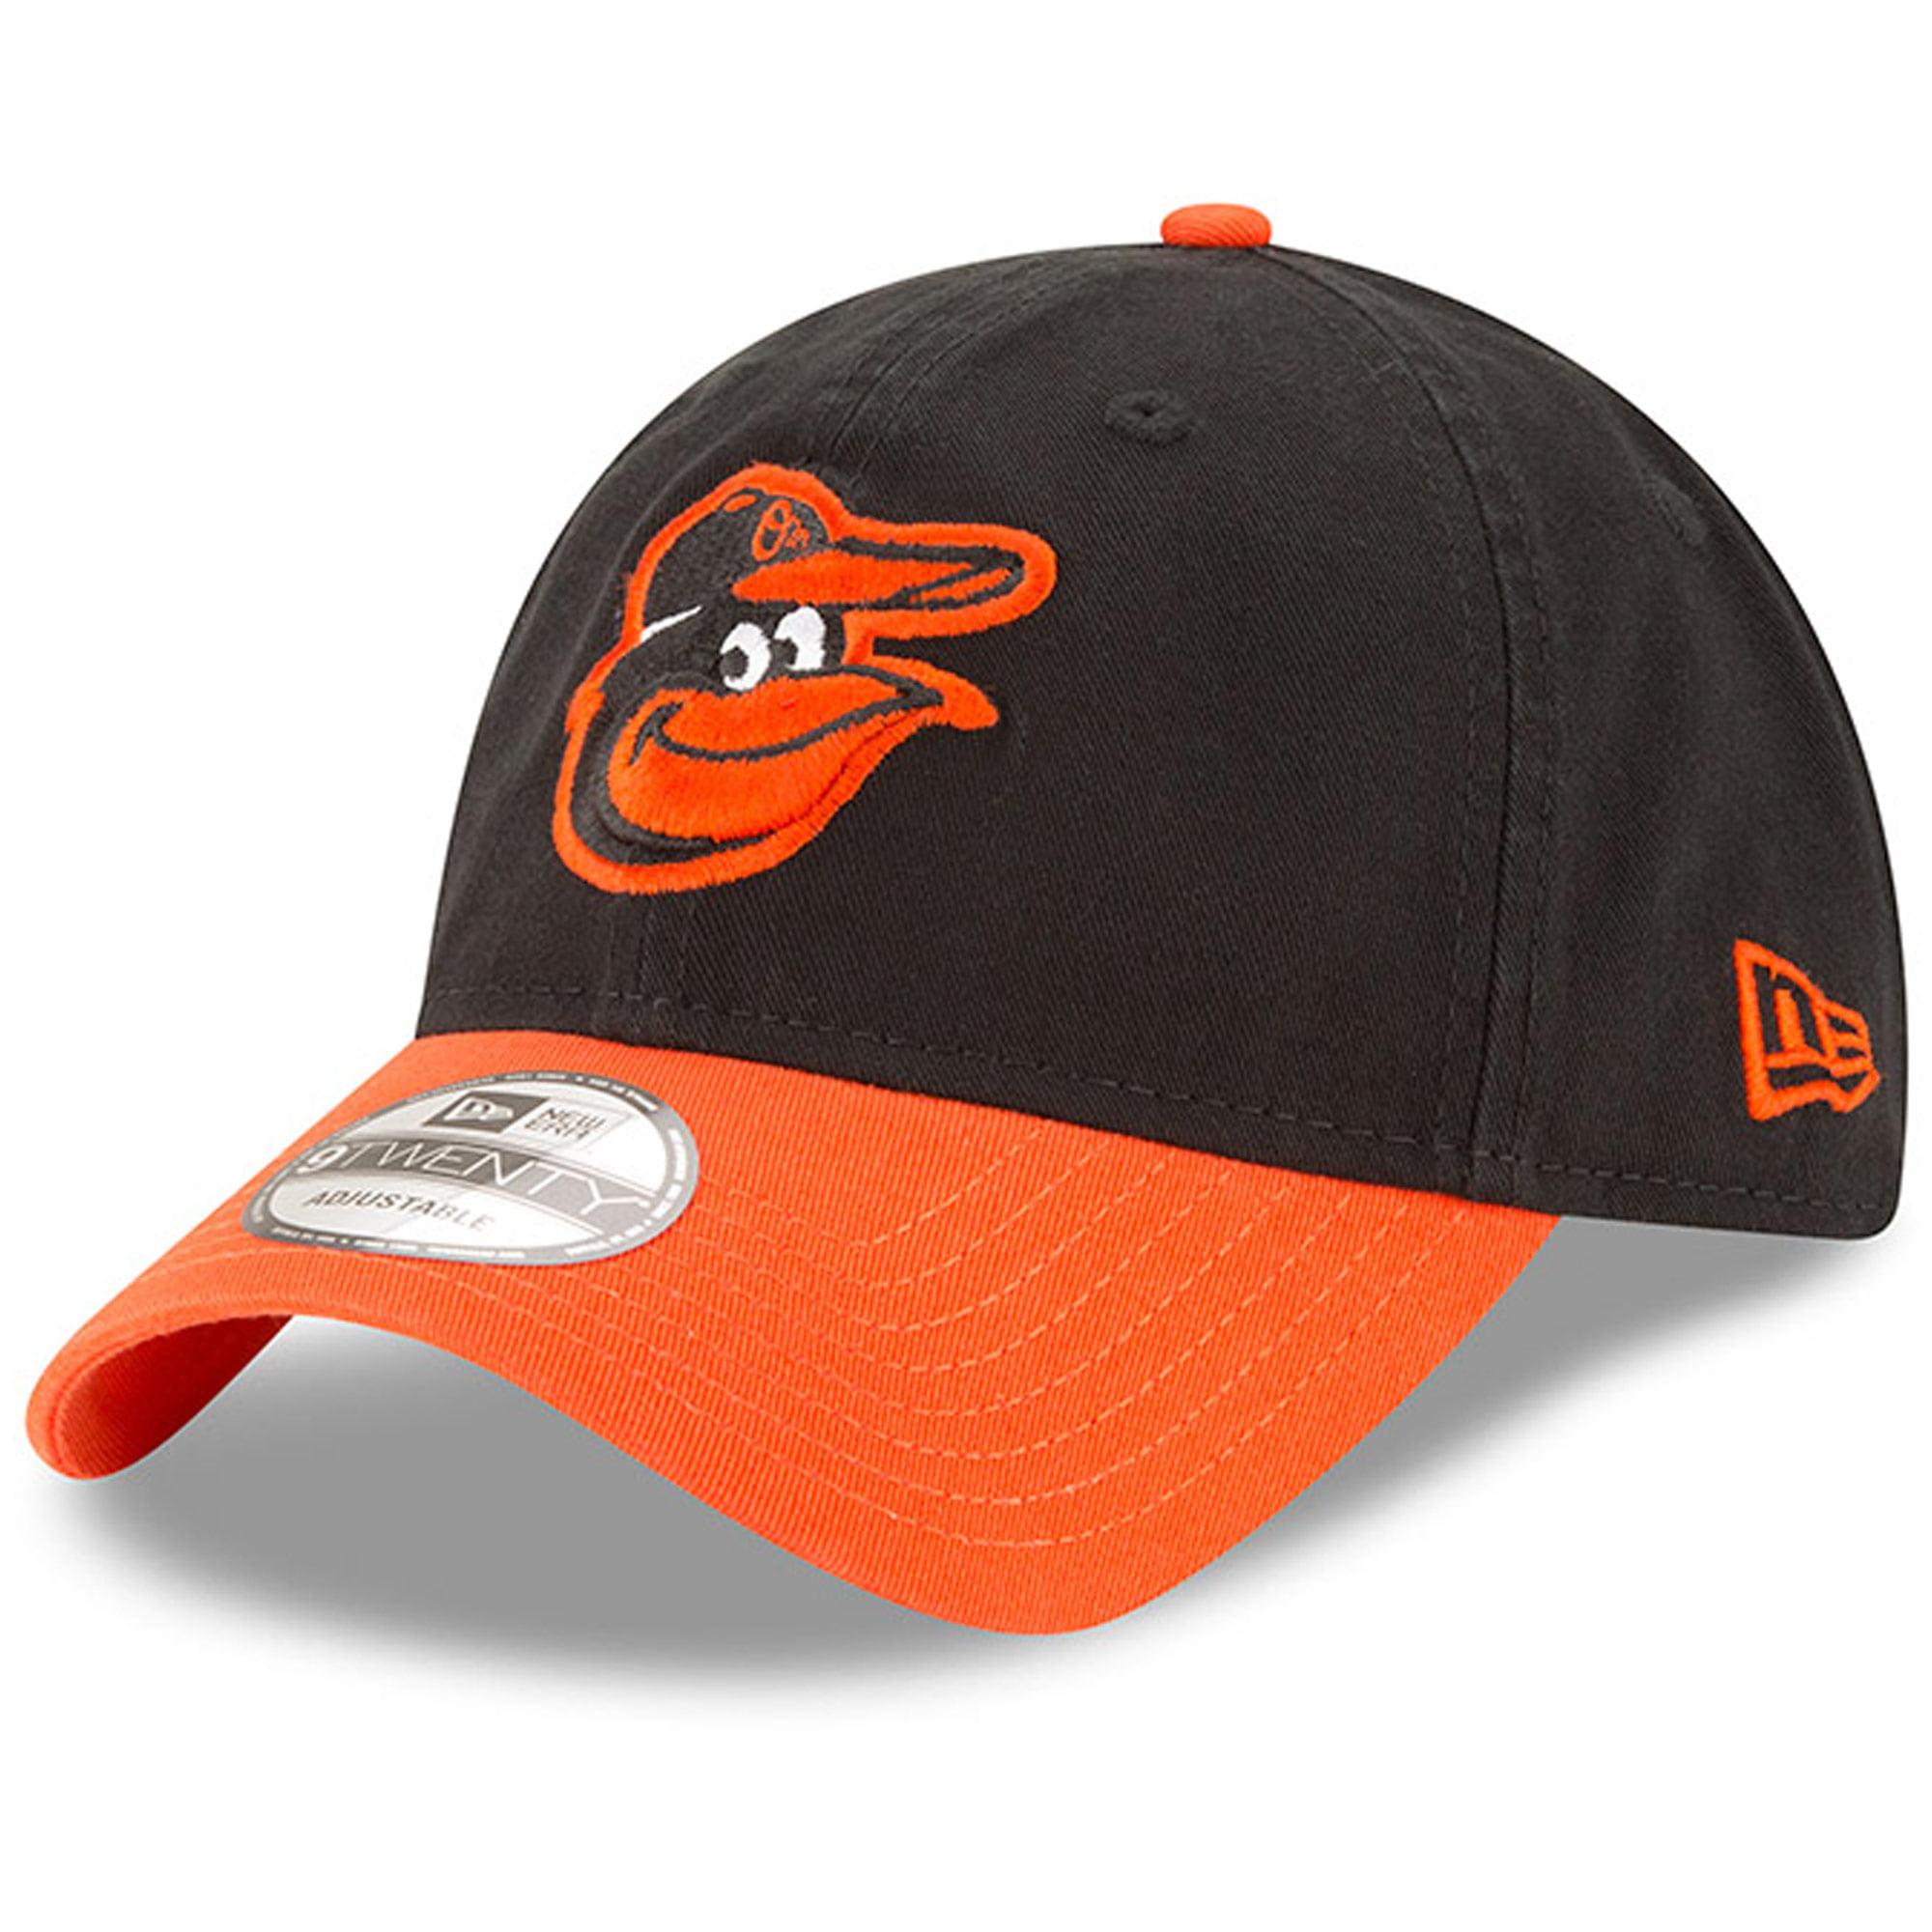 Baltimore Orioles New Era Home Replica Core Classic 9TWENTY Adjustable Hat - Black/Orange - OSFA